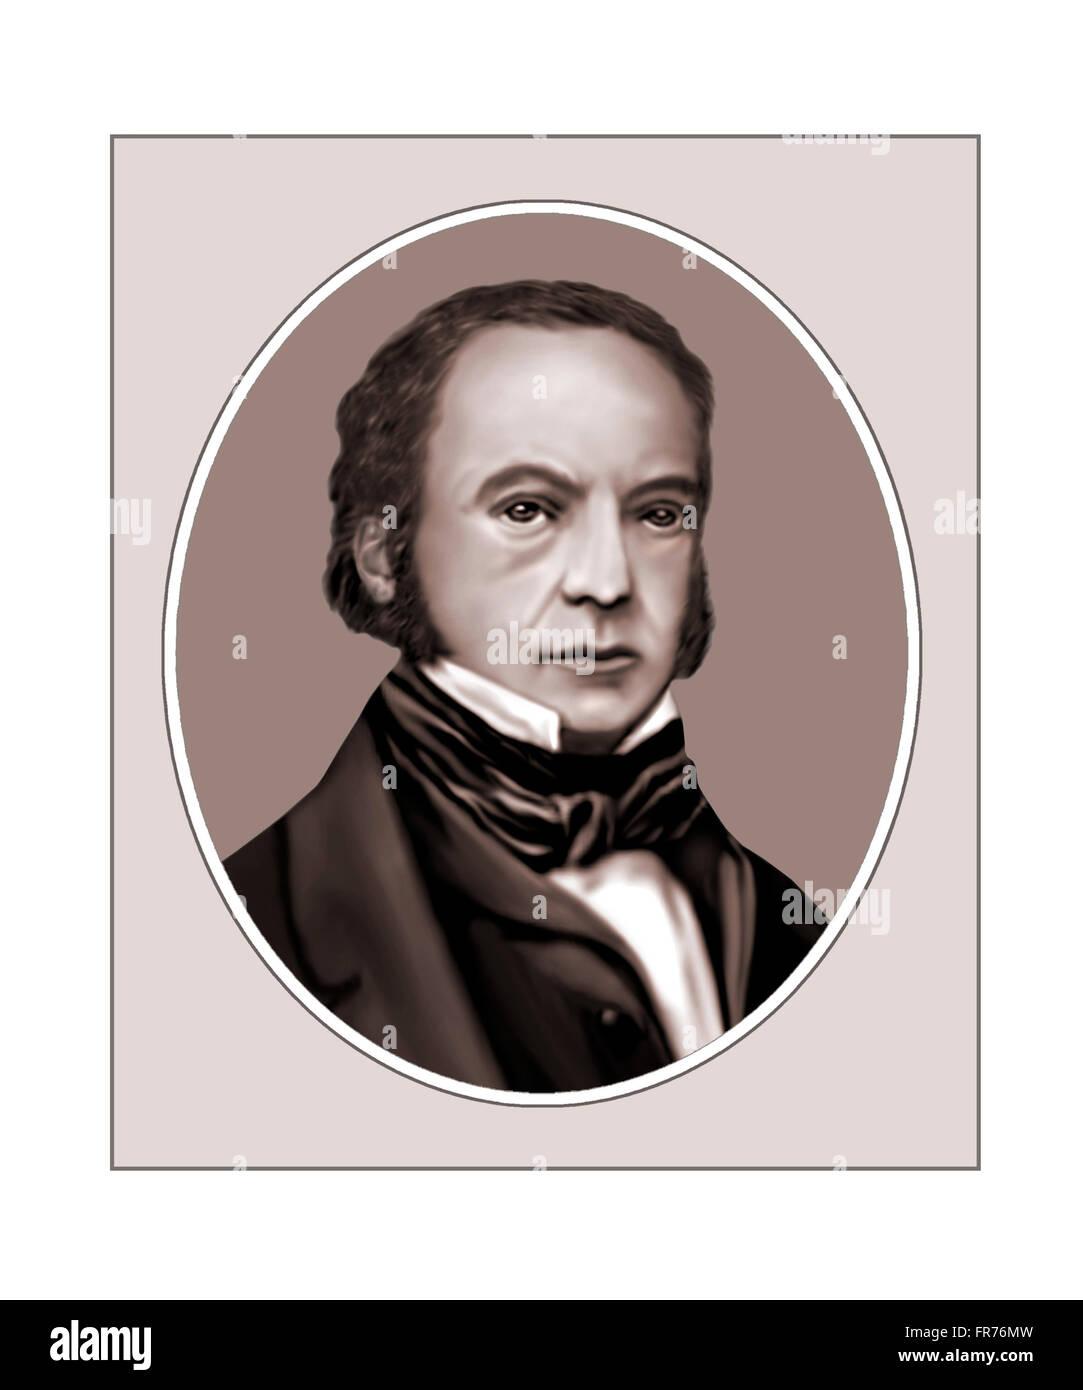 Isambard Kingdom Brunel, 1806-1859, Engineer, Portrait - Stock Image